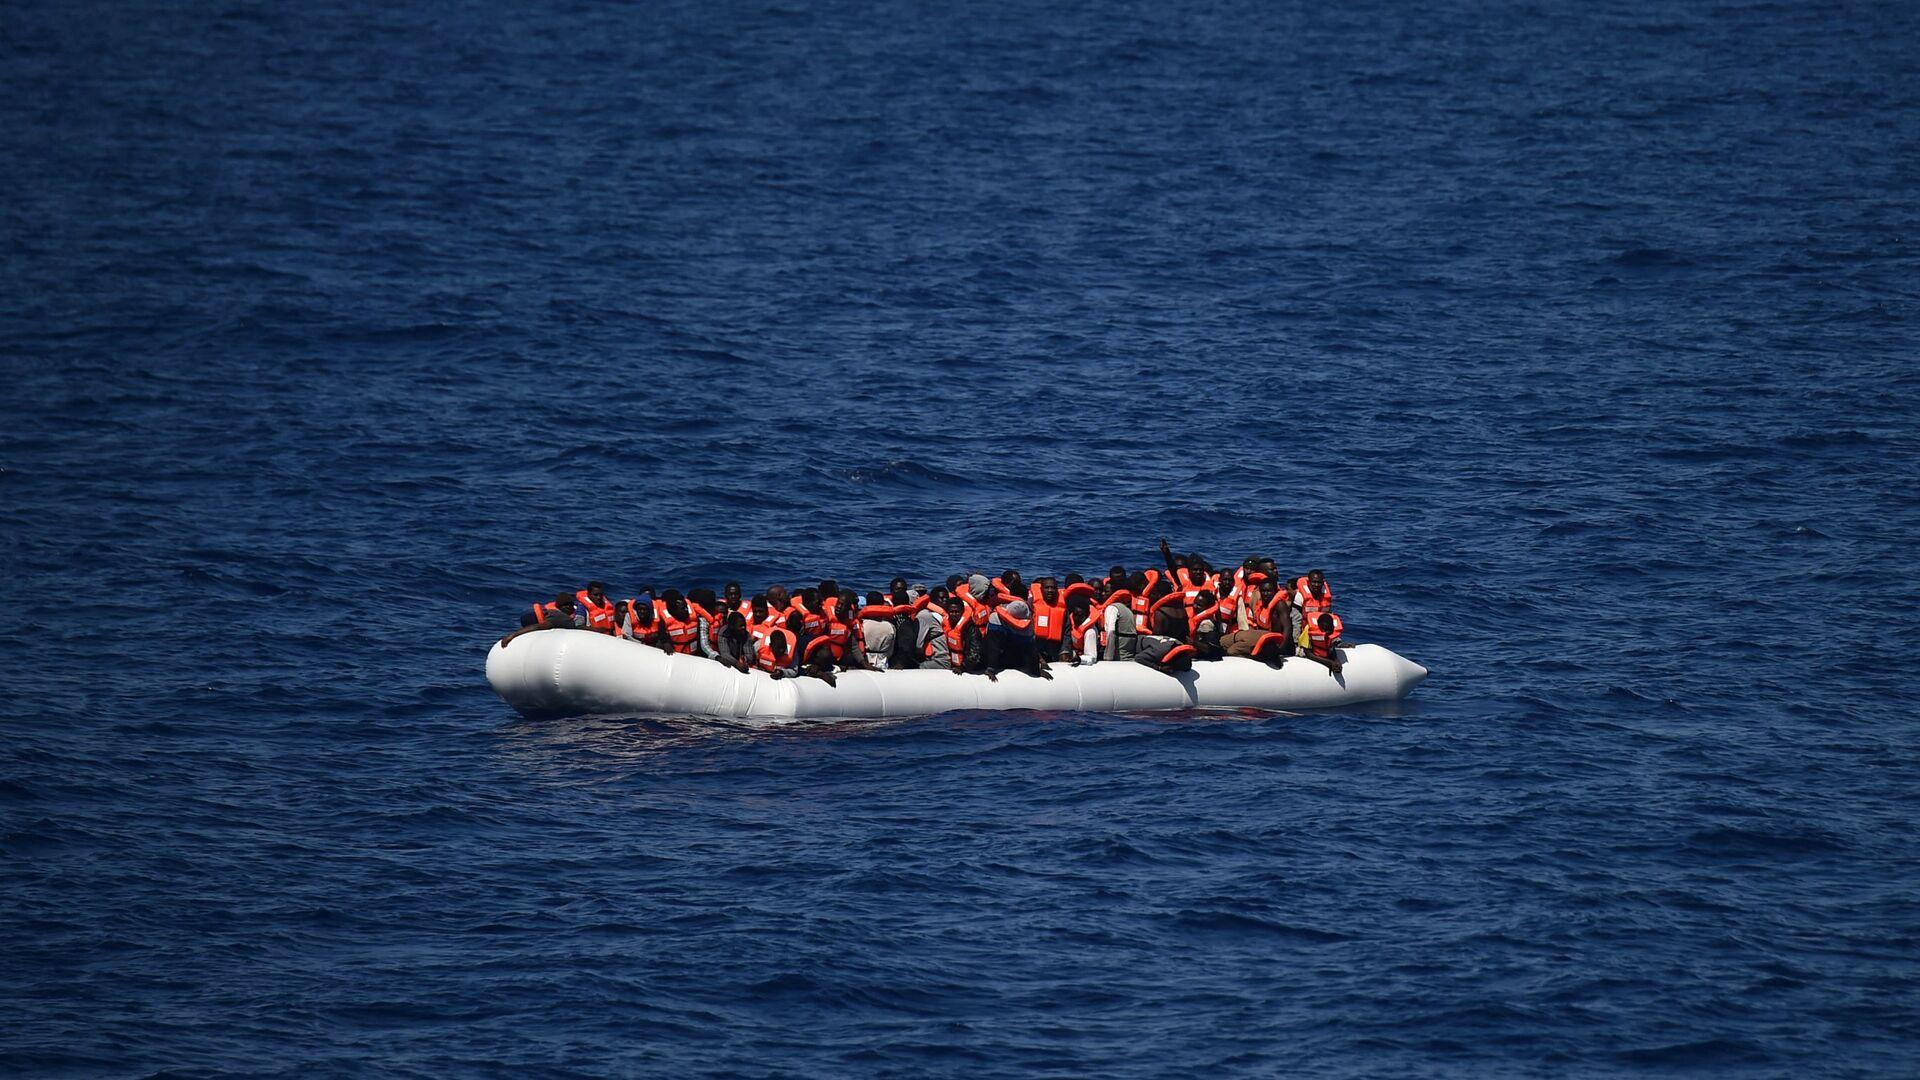 Migrants en mer Méditerranée - Sputnik France, 1920, 13.08.2021